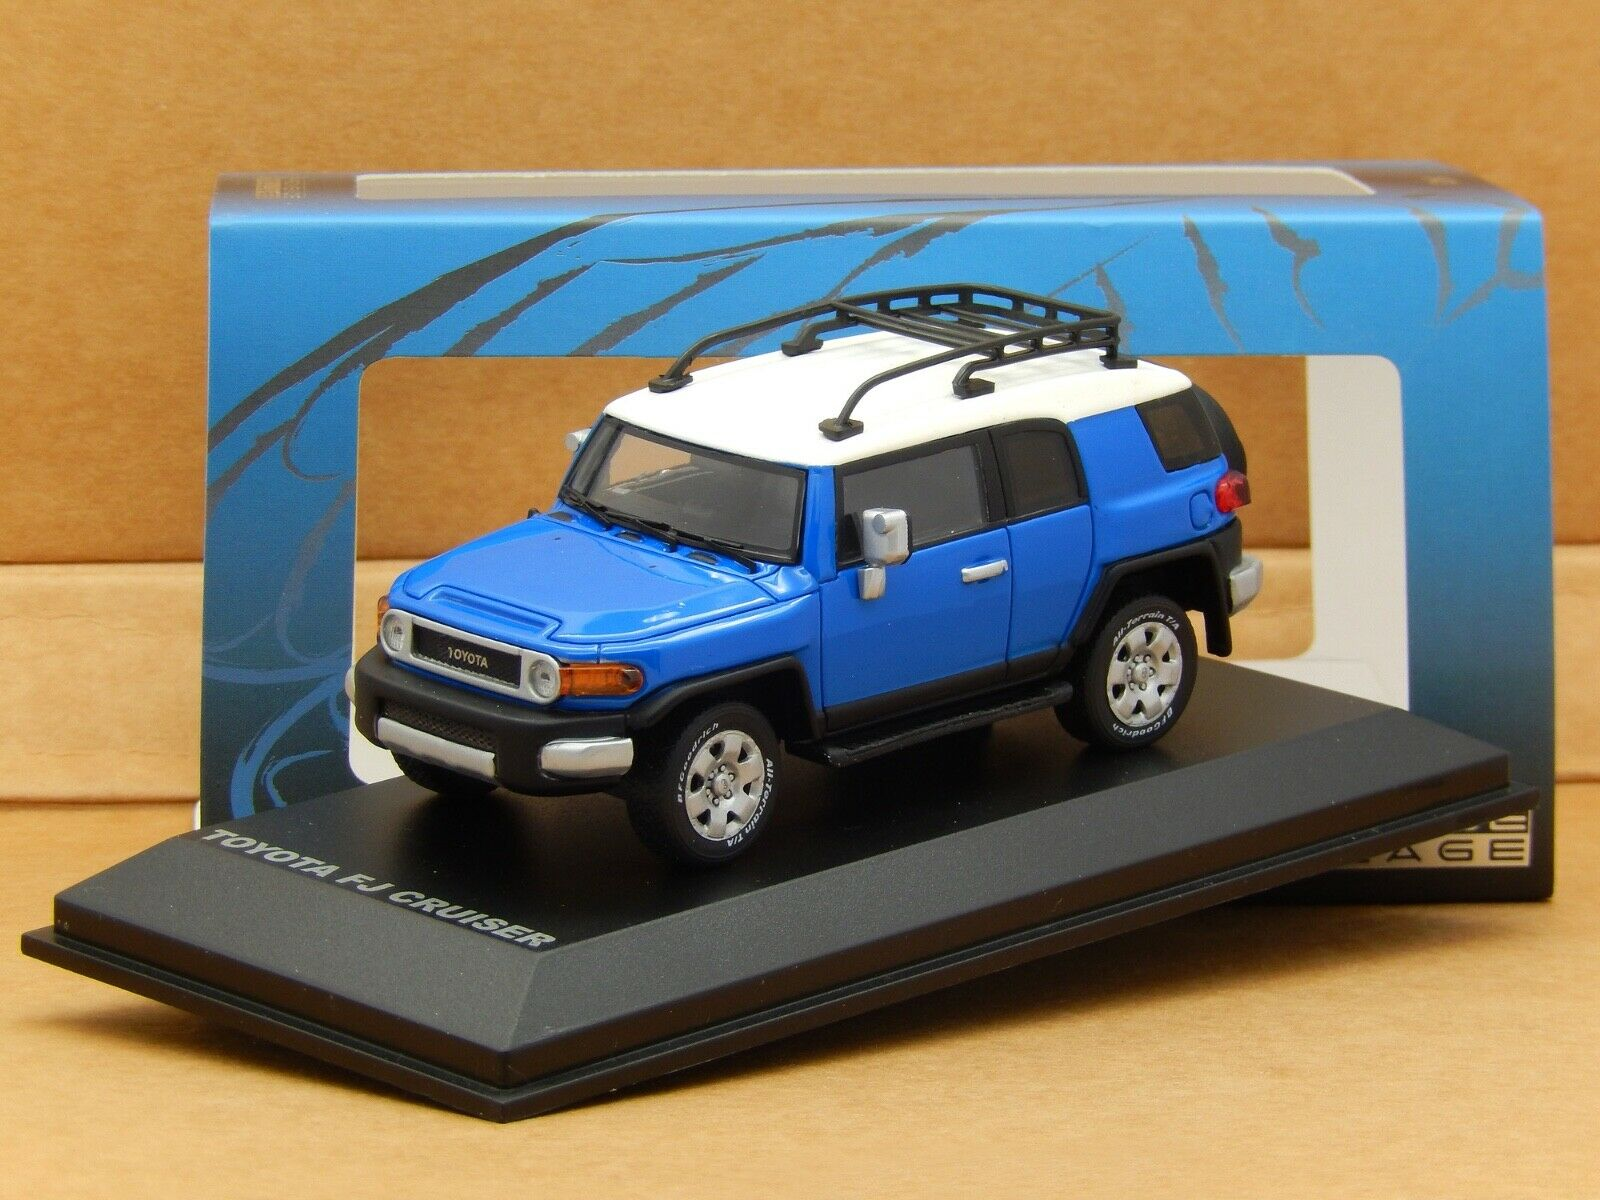 1 43 Toyota FJ Cruiser Voodoo bluee Norev Norev Norev Provence Moulage Resin Model Rare 1f0919